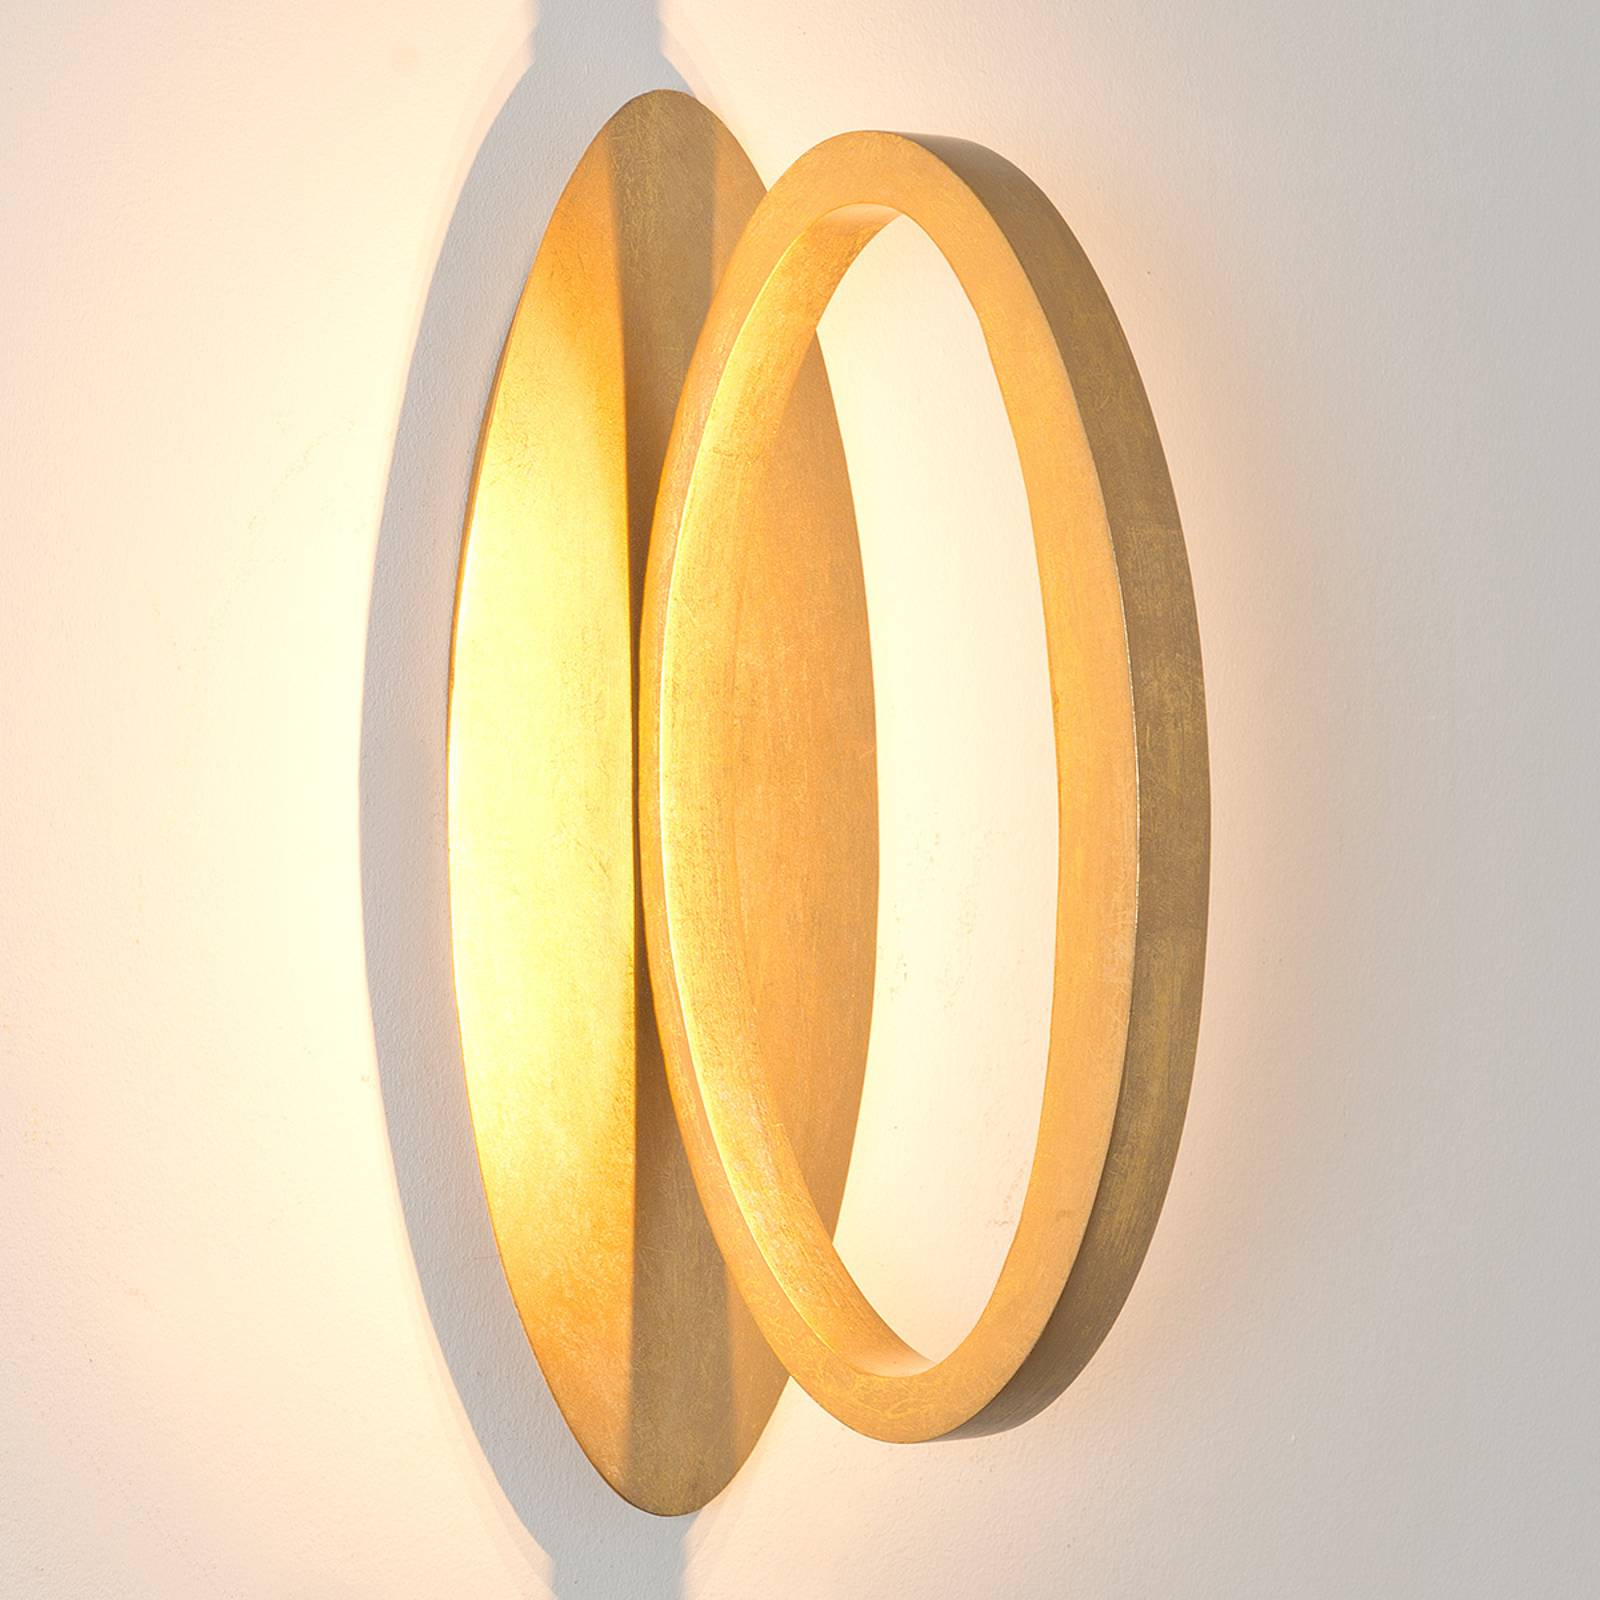 Seinävalaisin Asterico, LED